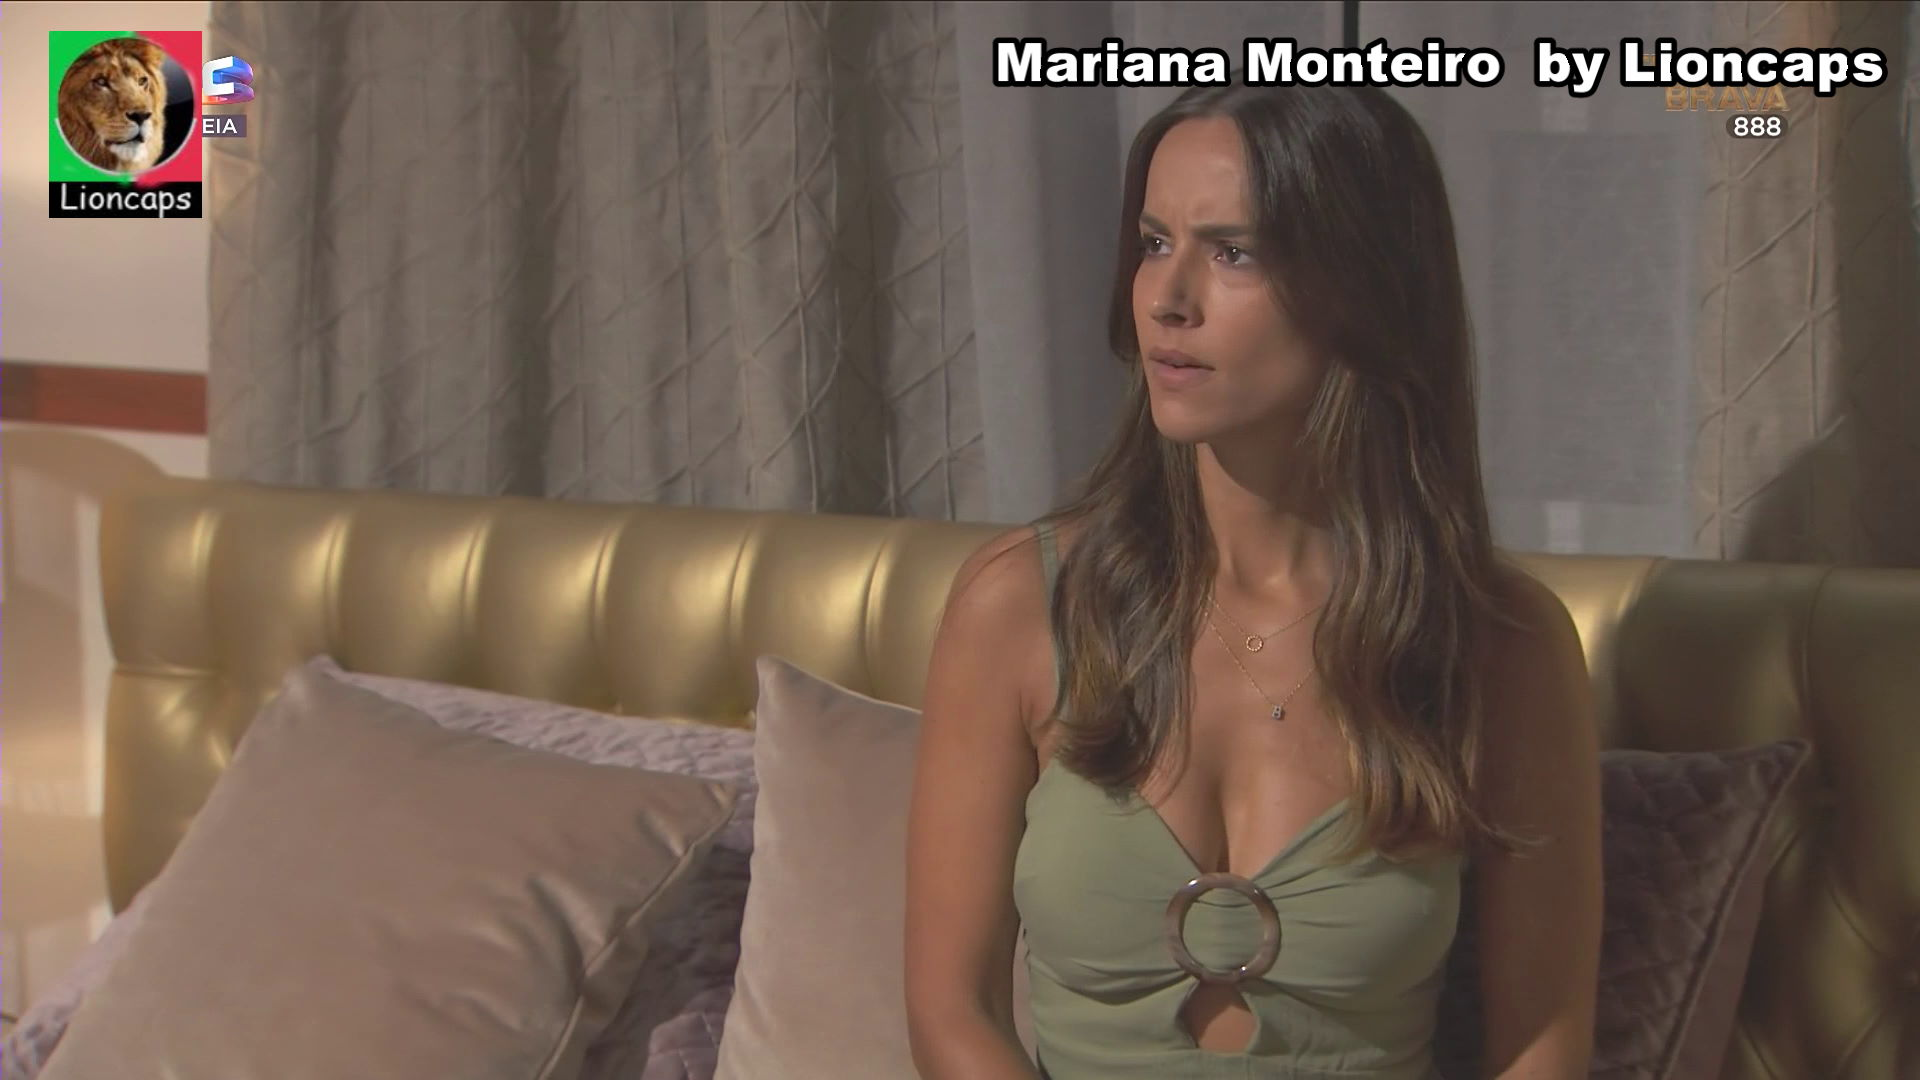 634935307_mariana_monteiro_vs191124_2716_122_28lo.JPG